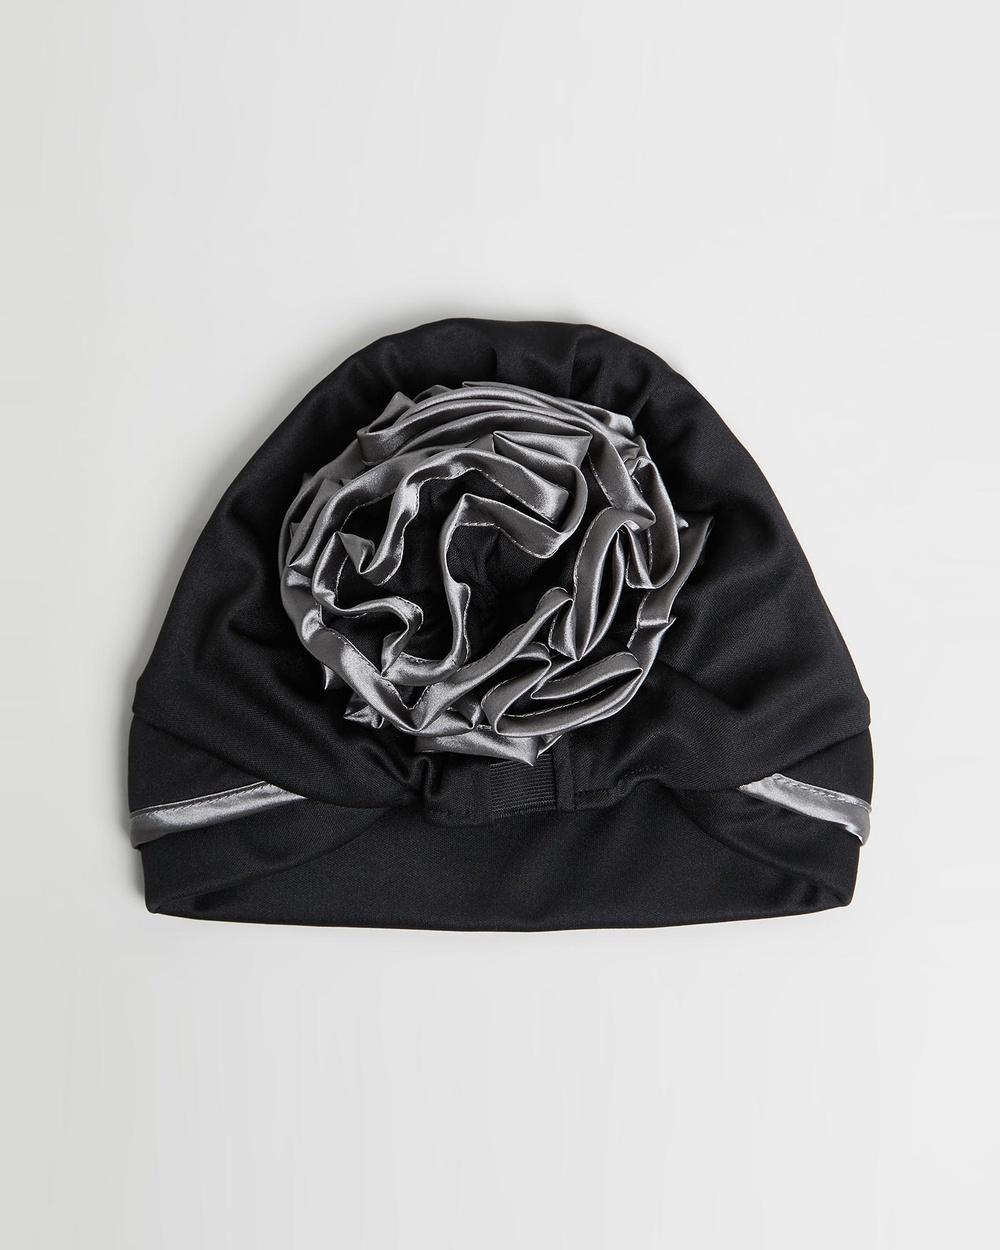 Max Alexander Turban Headscarf Headwear Black & Silver